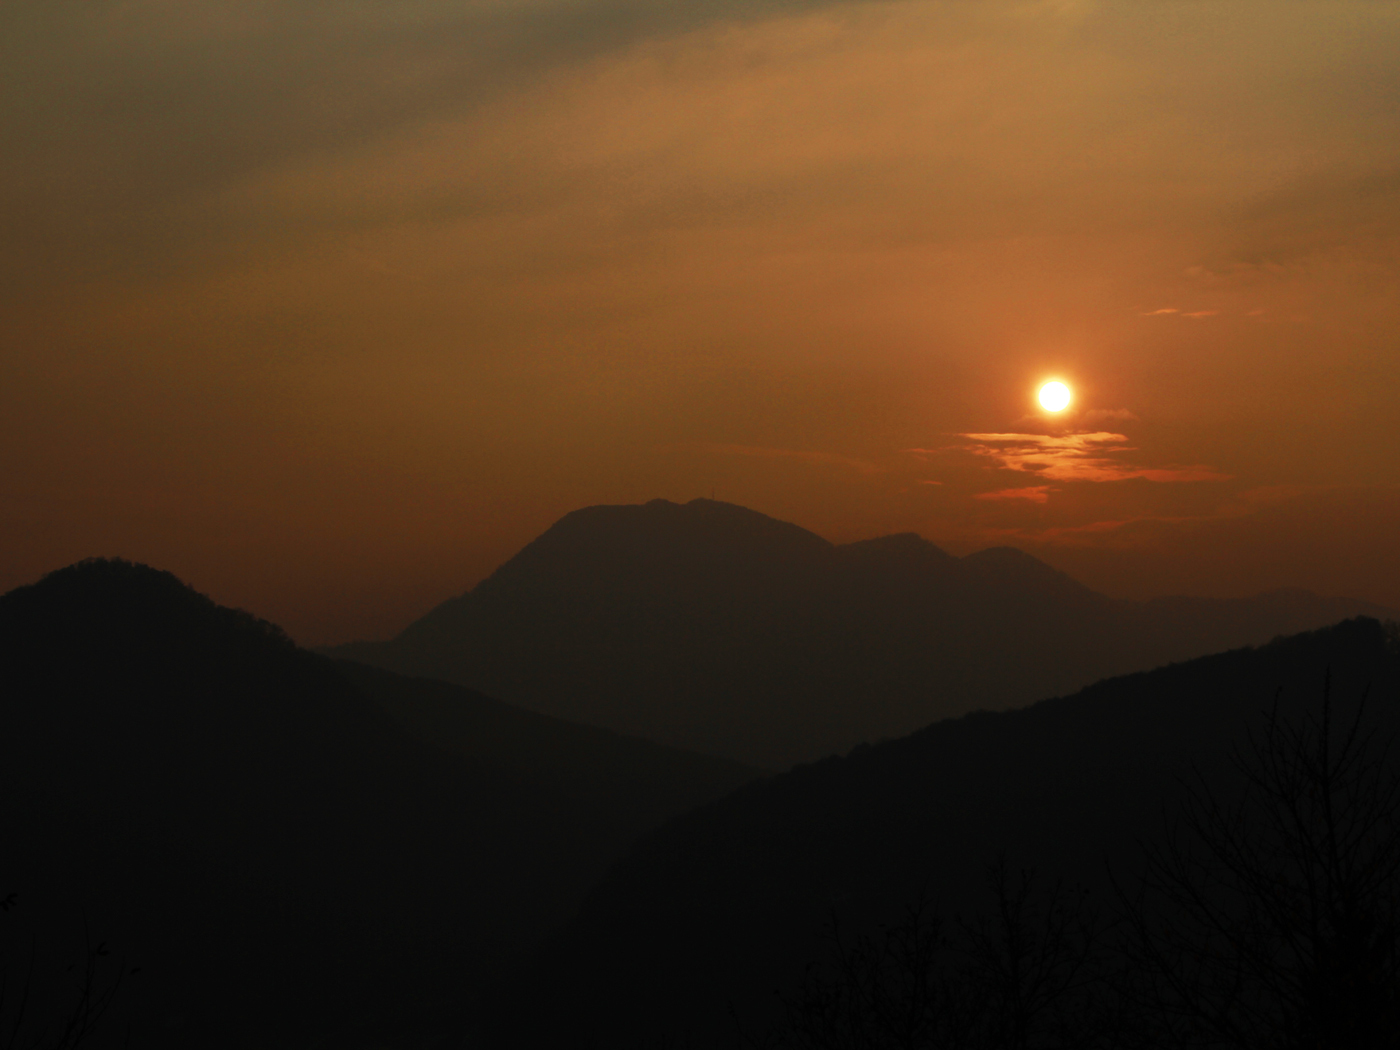 Pavel Kumer_Odhod sonca